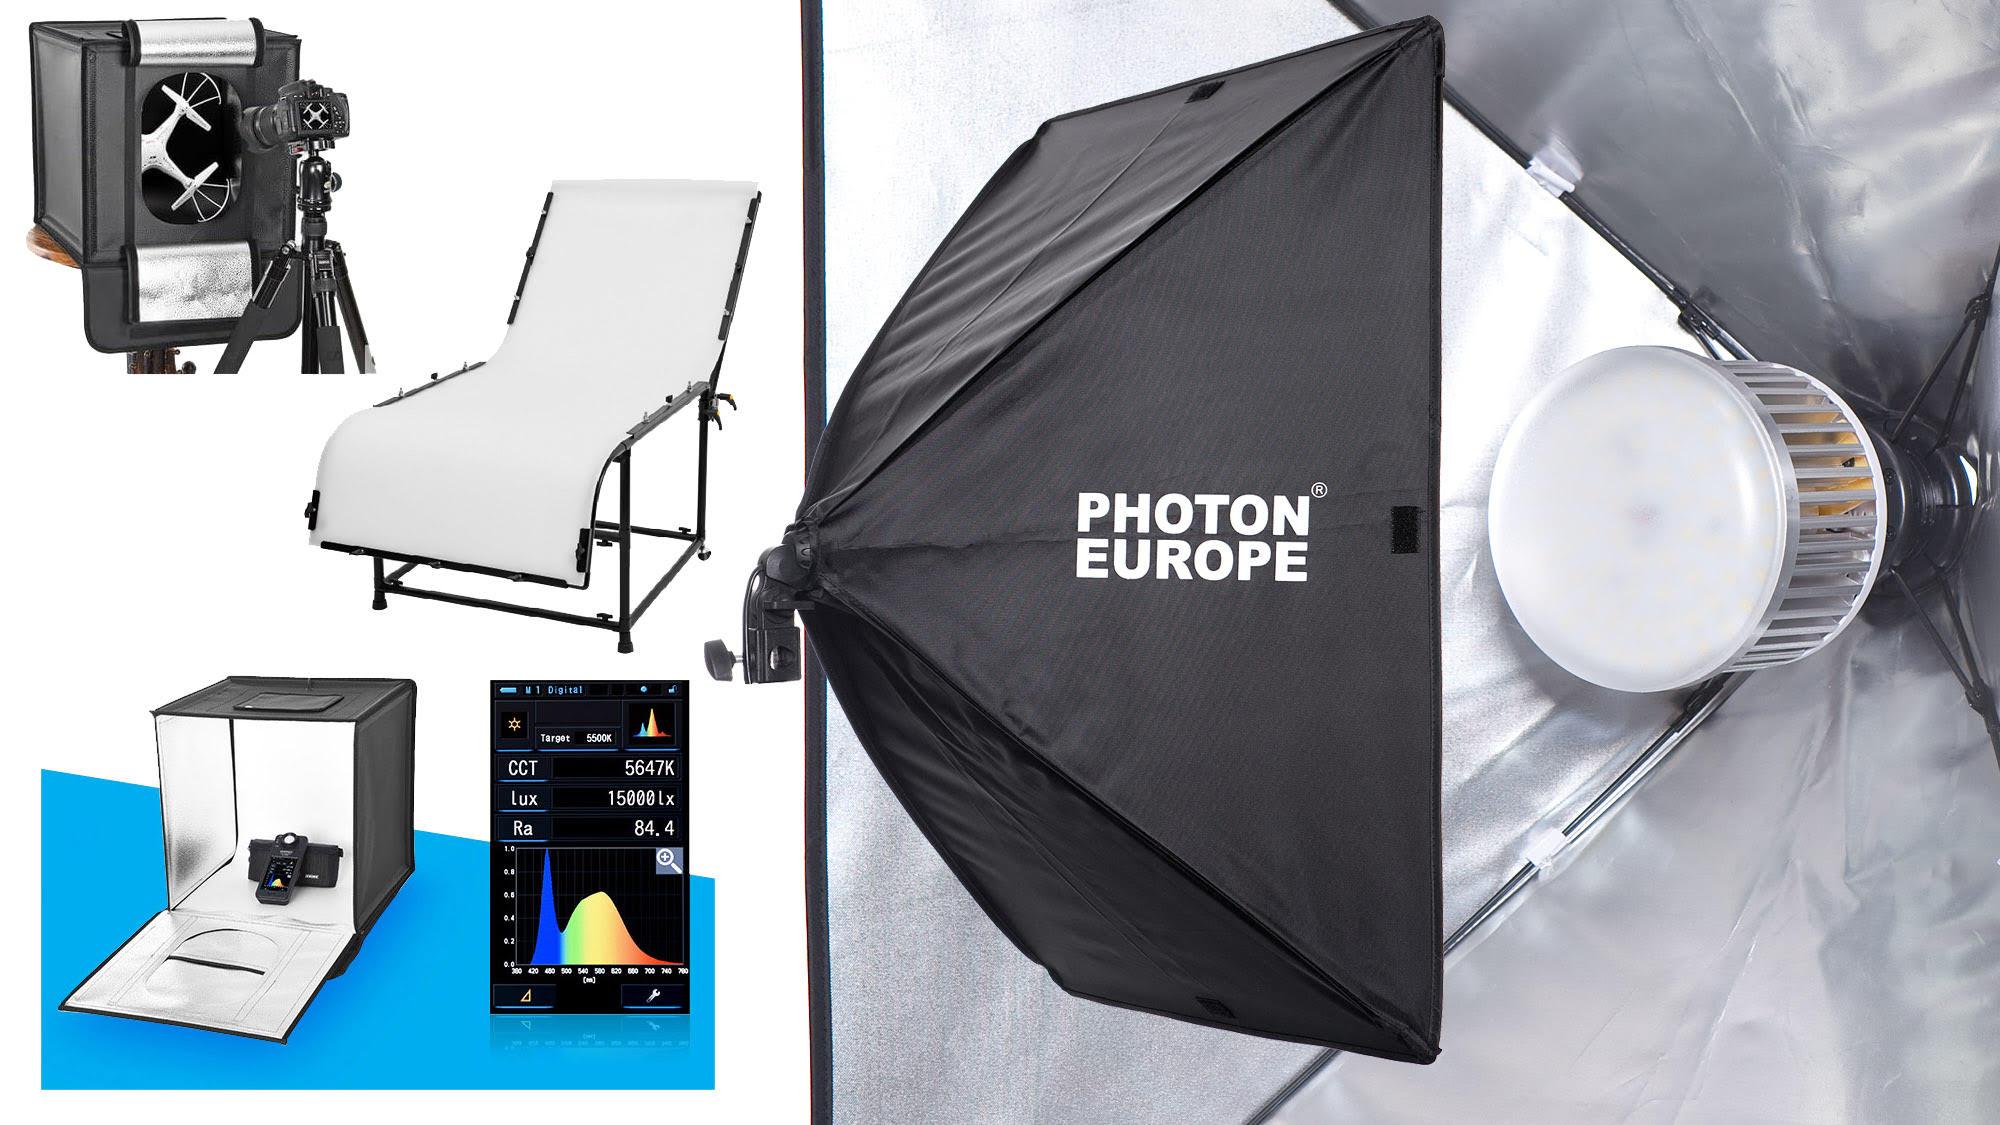 jak fotit produktove fotogrfie